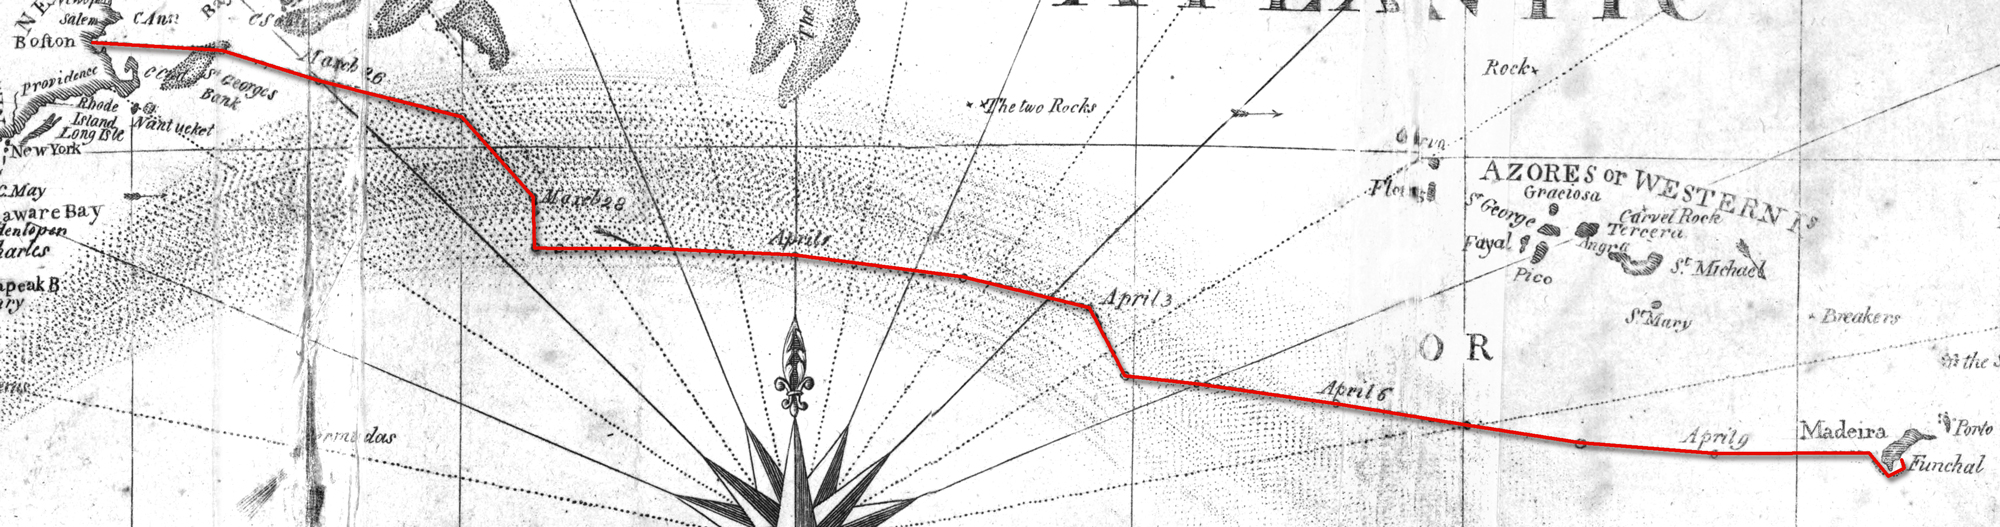 Bowditch-Sailing-Traverse-Atlantic_02